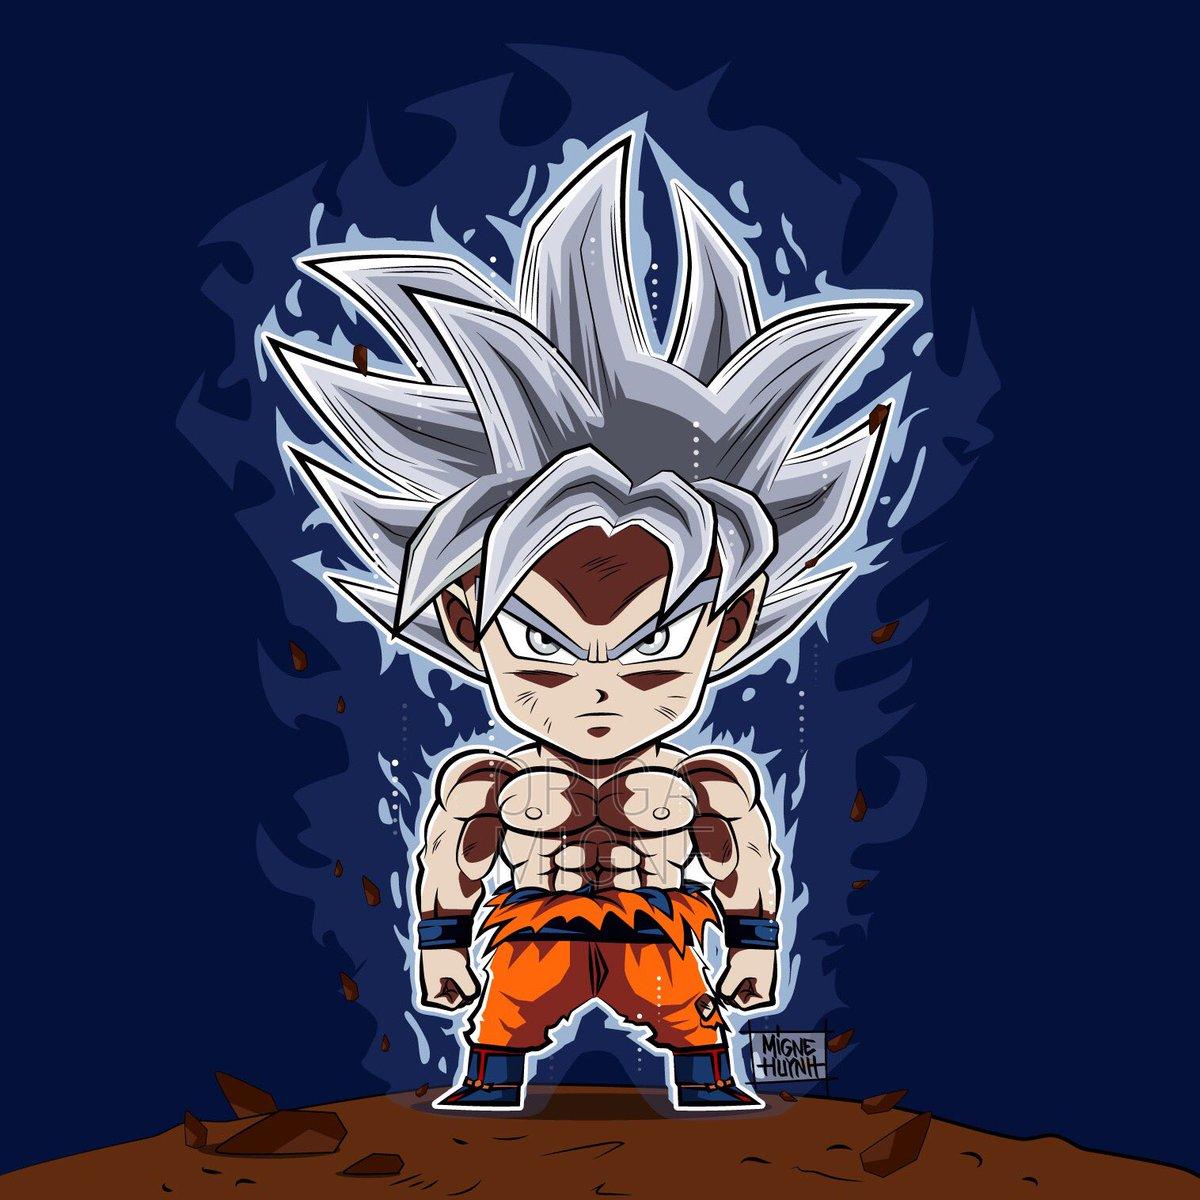 Migne Sur Twitter Goku Ultra Instinct Maitrise Dragonballsuper